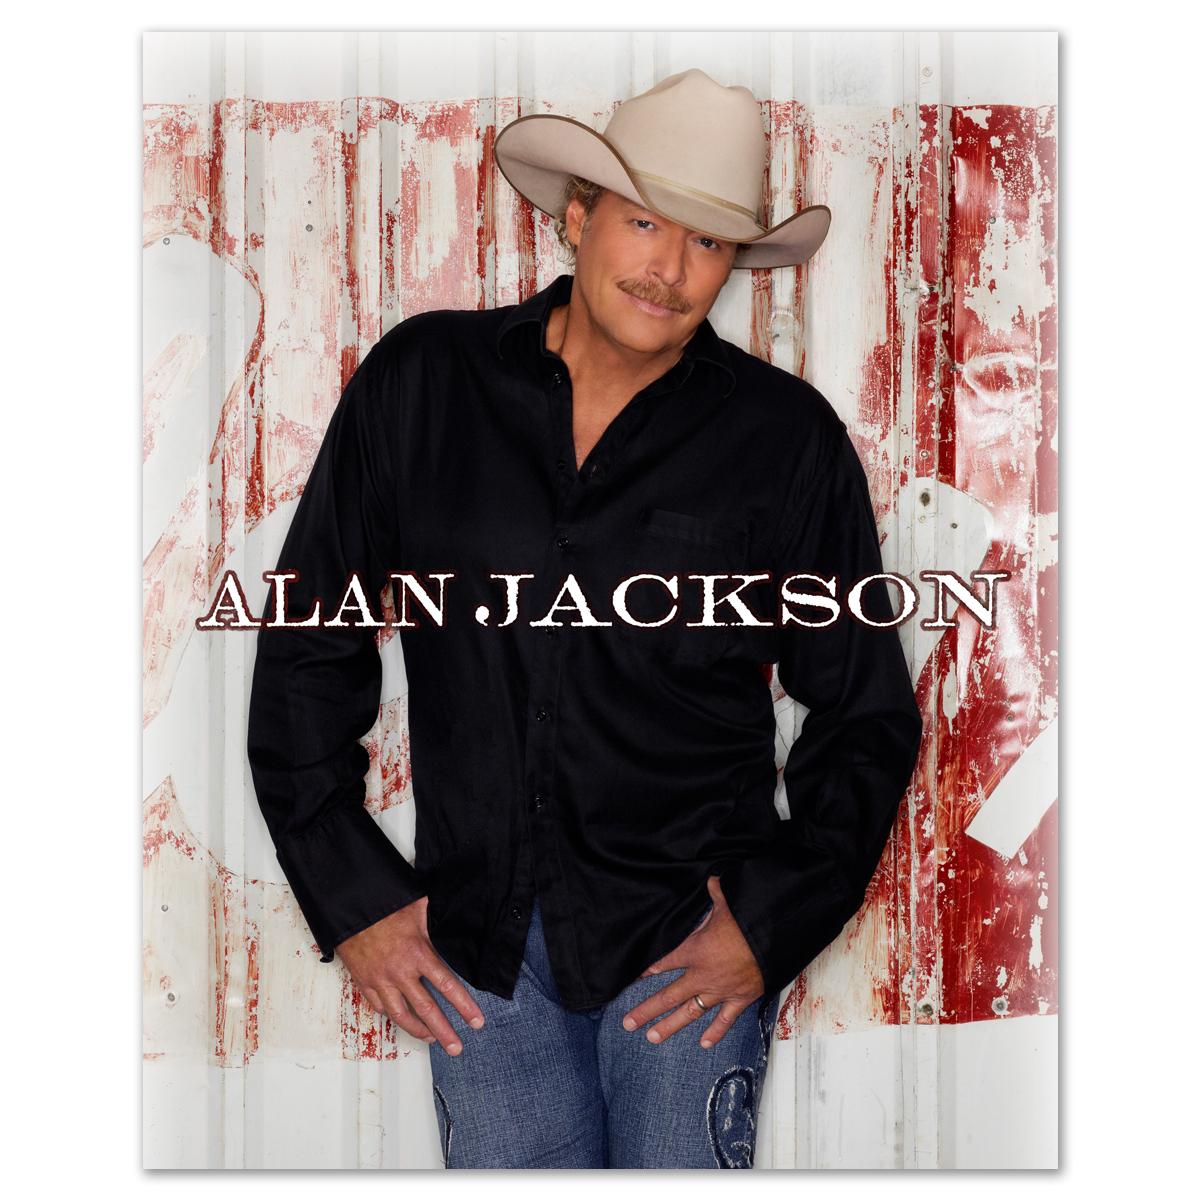 Alan jackson 8x10 photo shop the bravado superstore official store